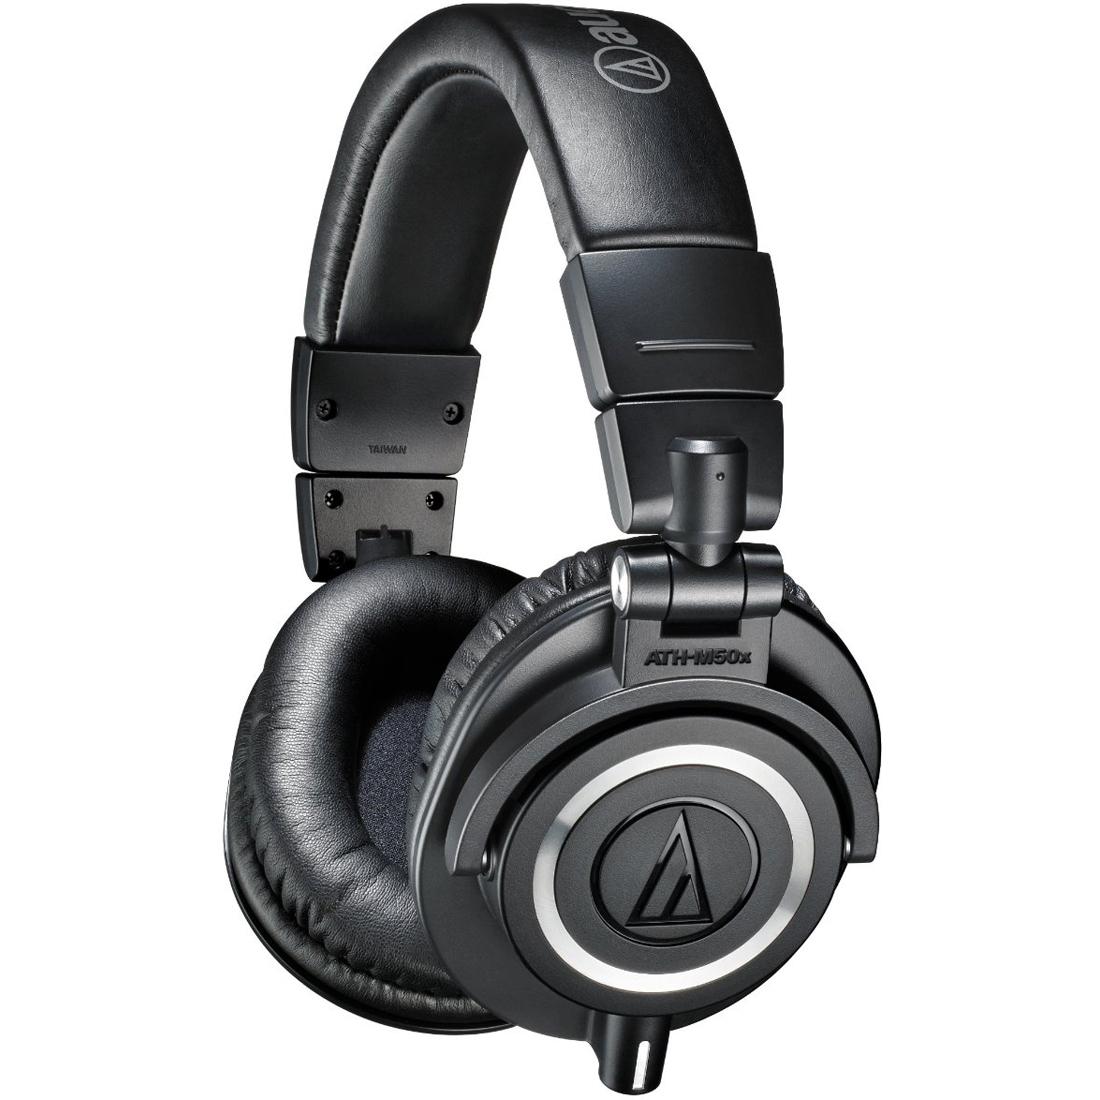 audio technica ath m50x pro studio headphones black usb audio interface bundle ebay. Black Bedroom Furniture Sets. Home Design Ideas